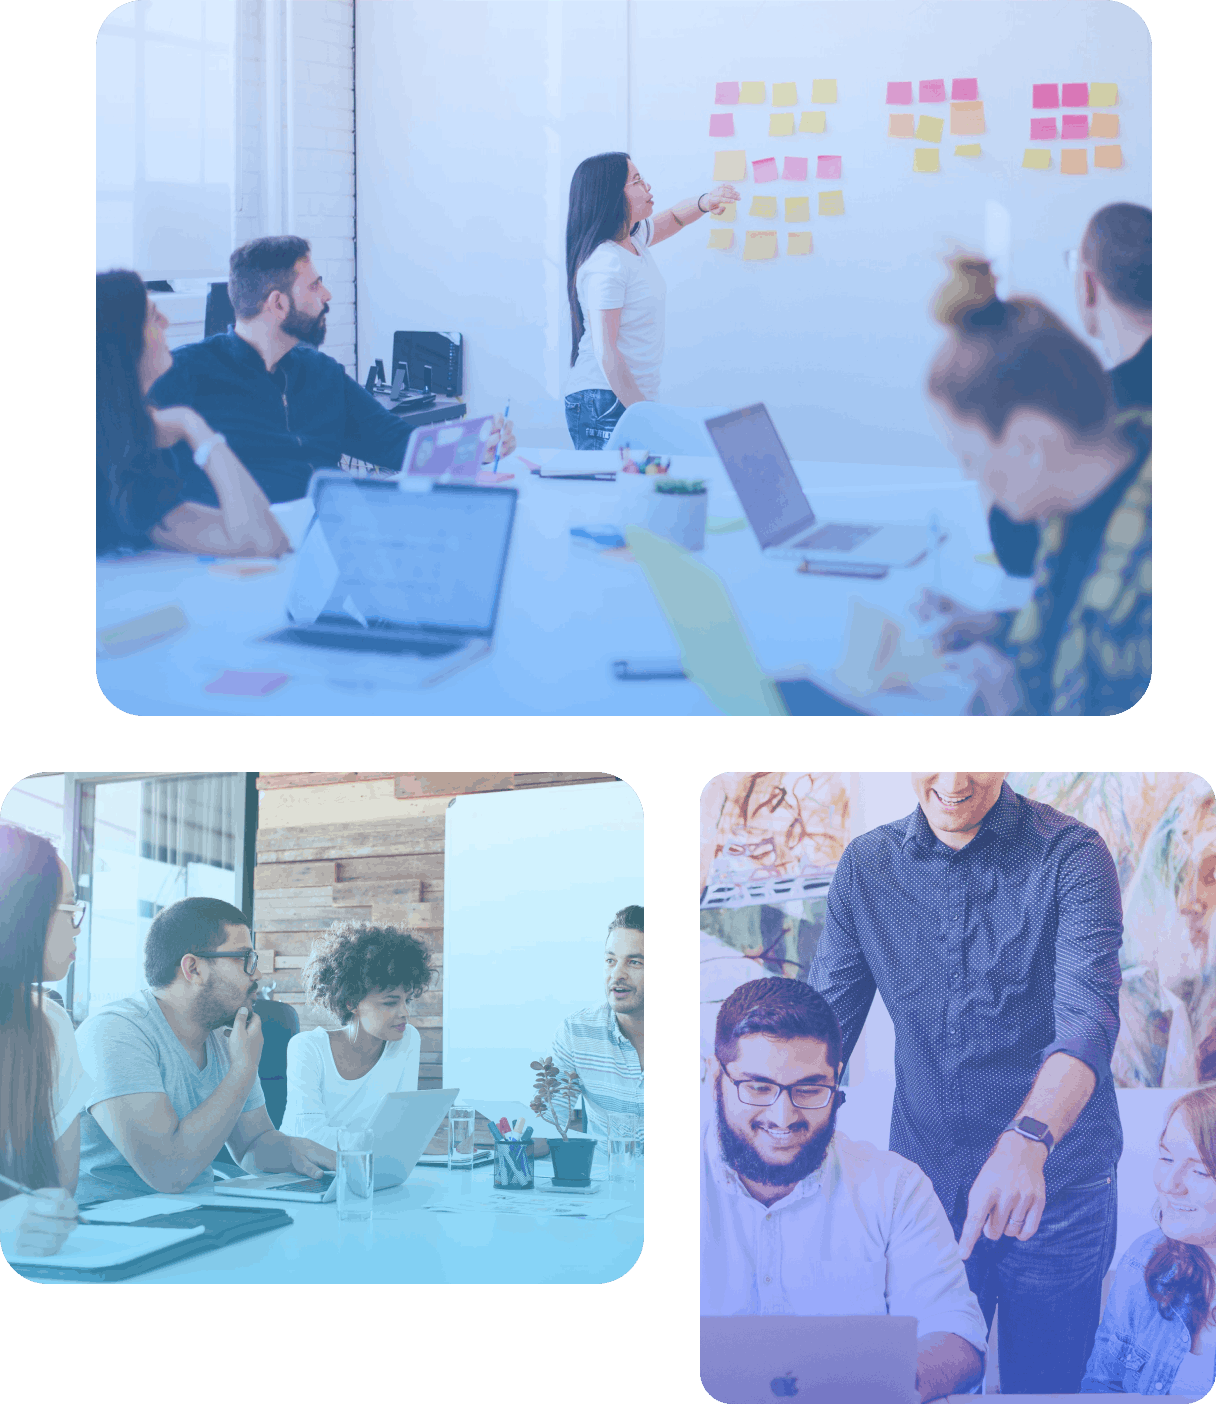 Three images showing people in meetings